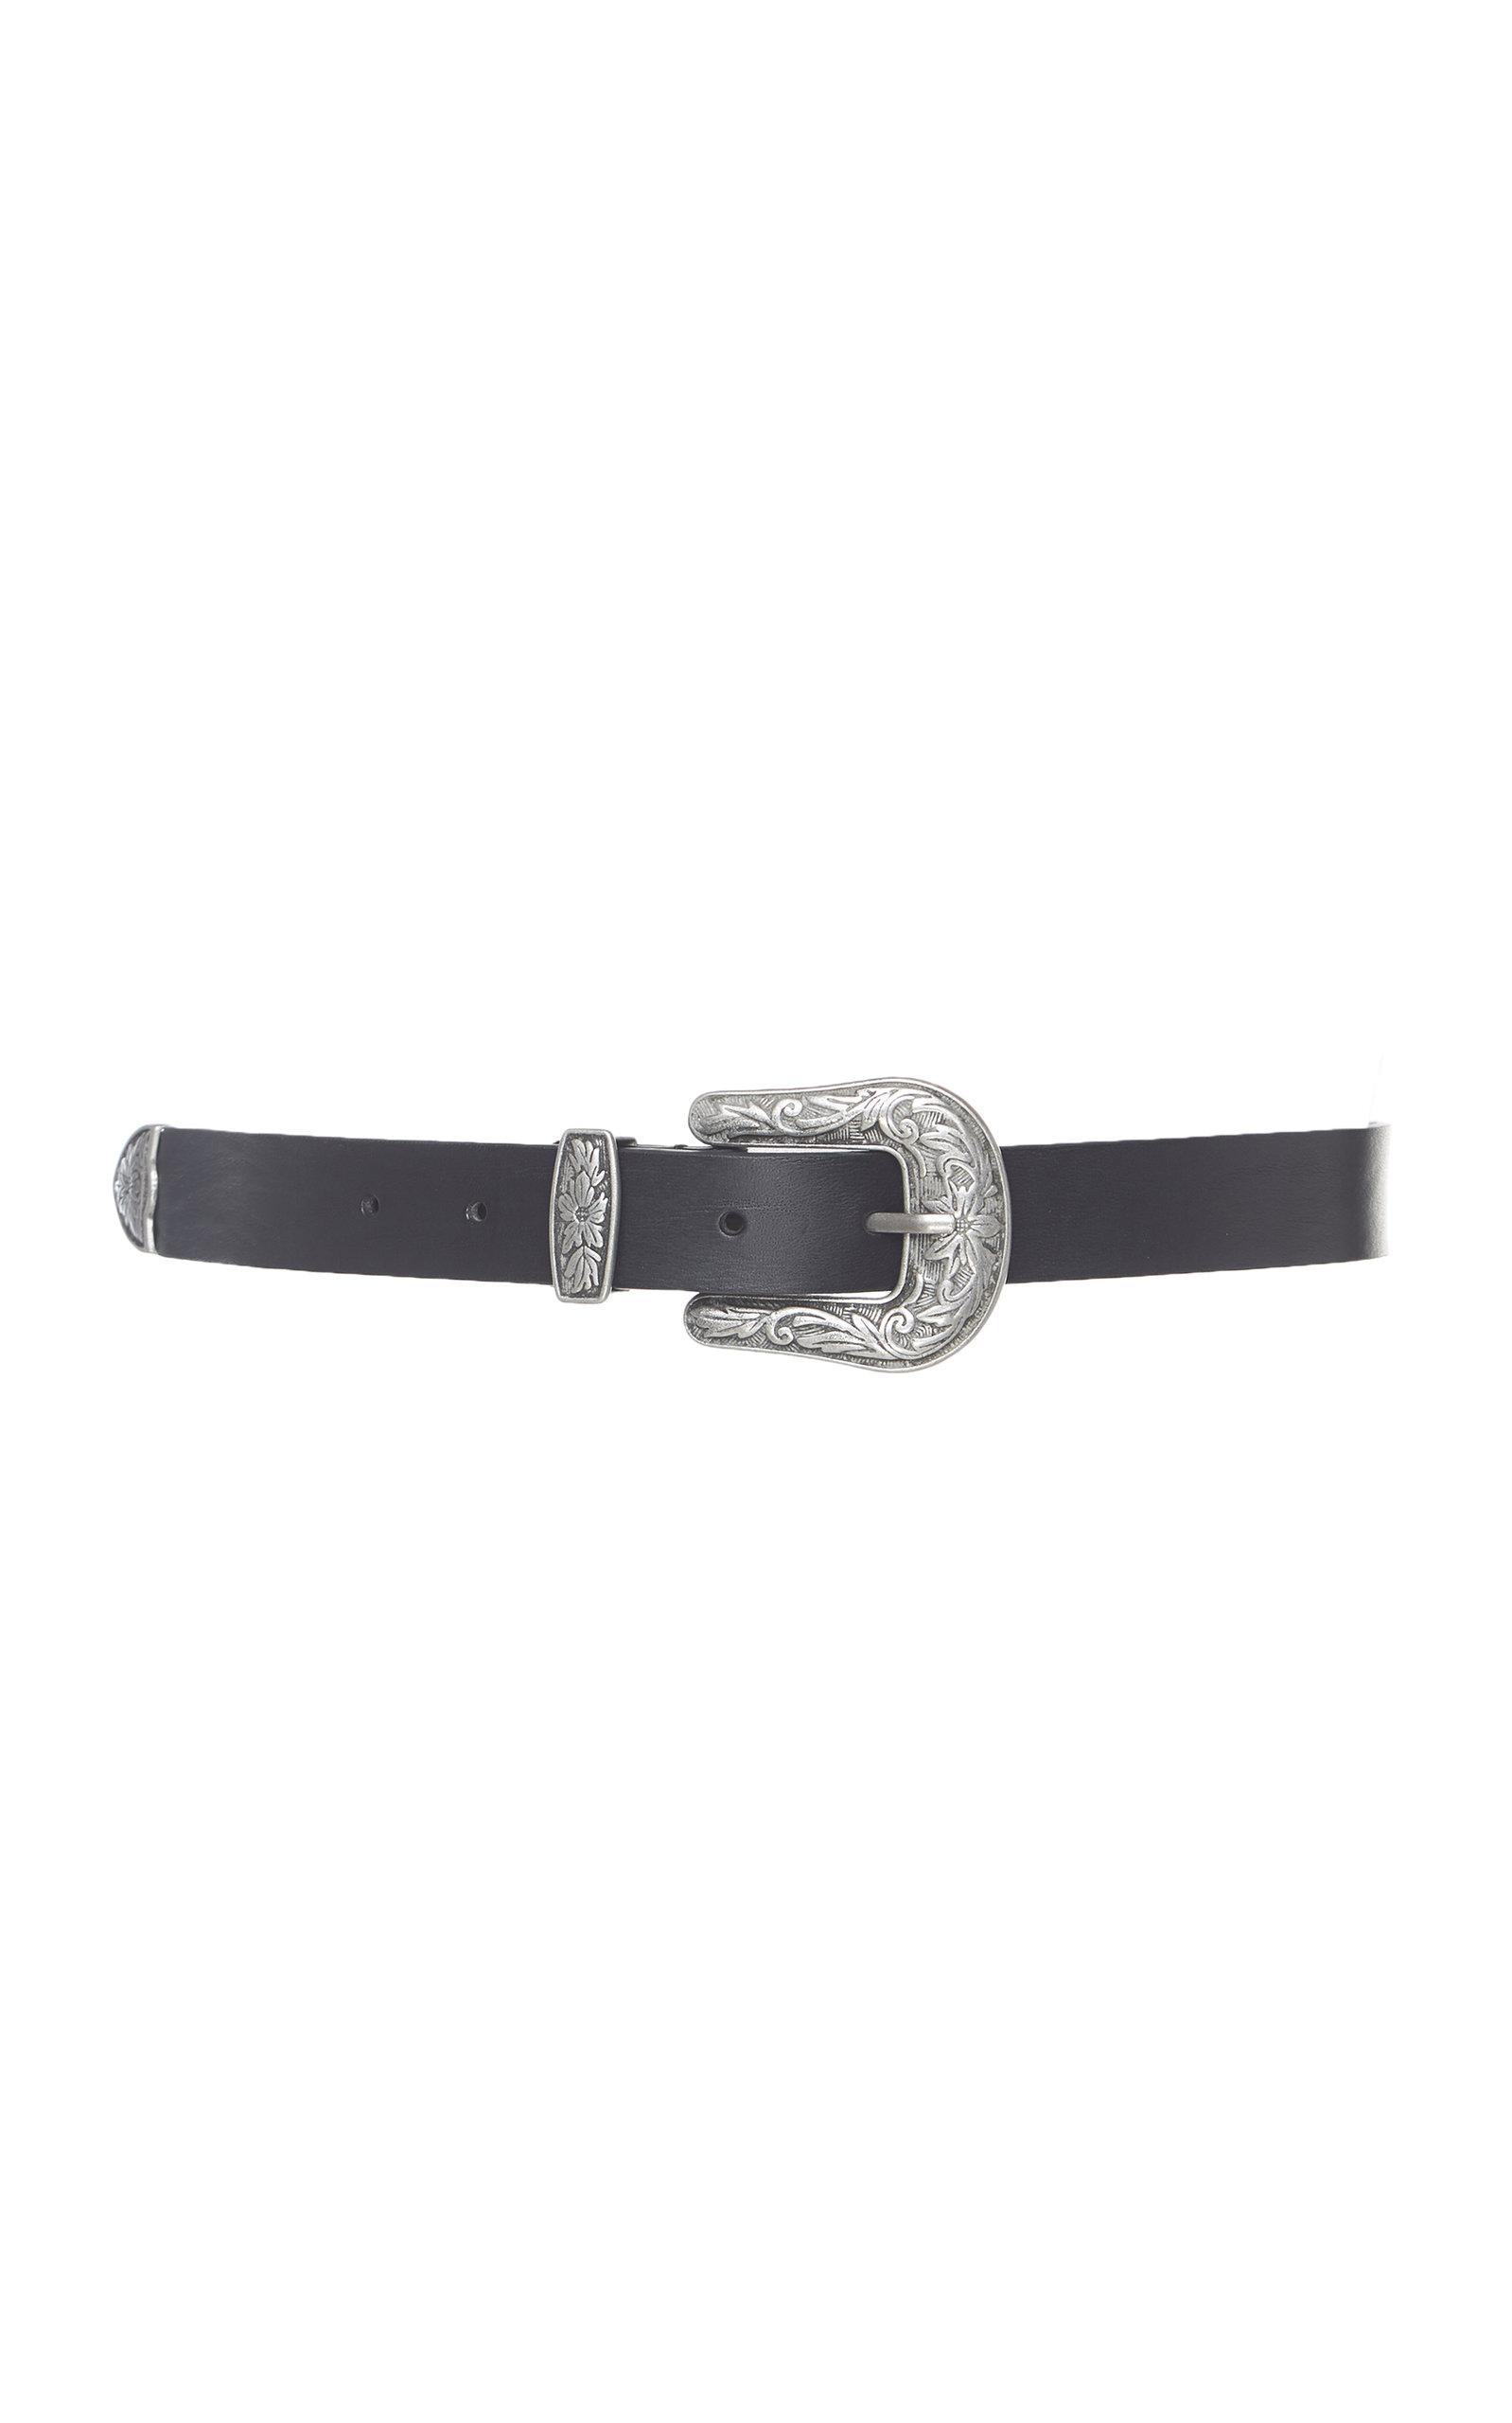 Leather belt Alberta Ferretti 1jpuM